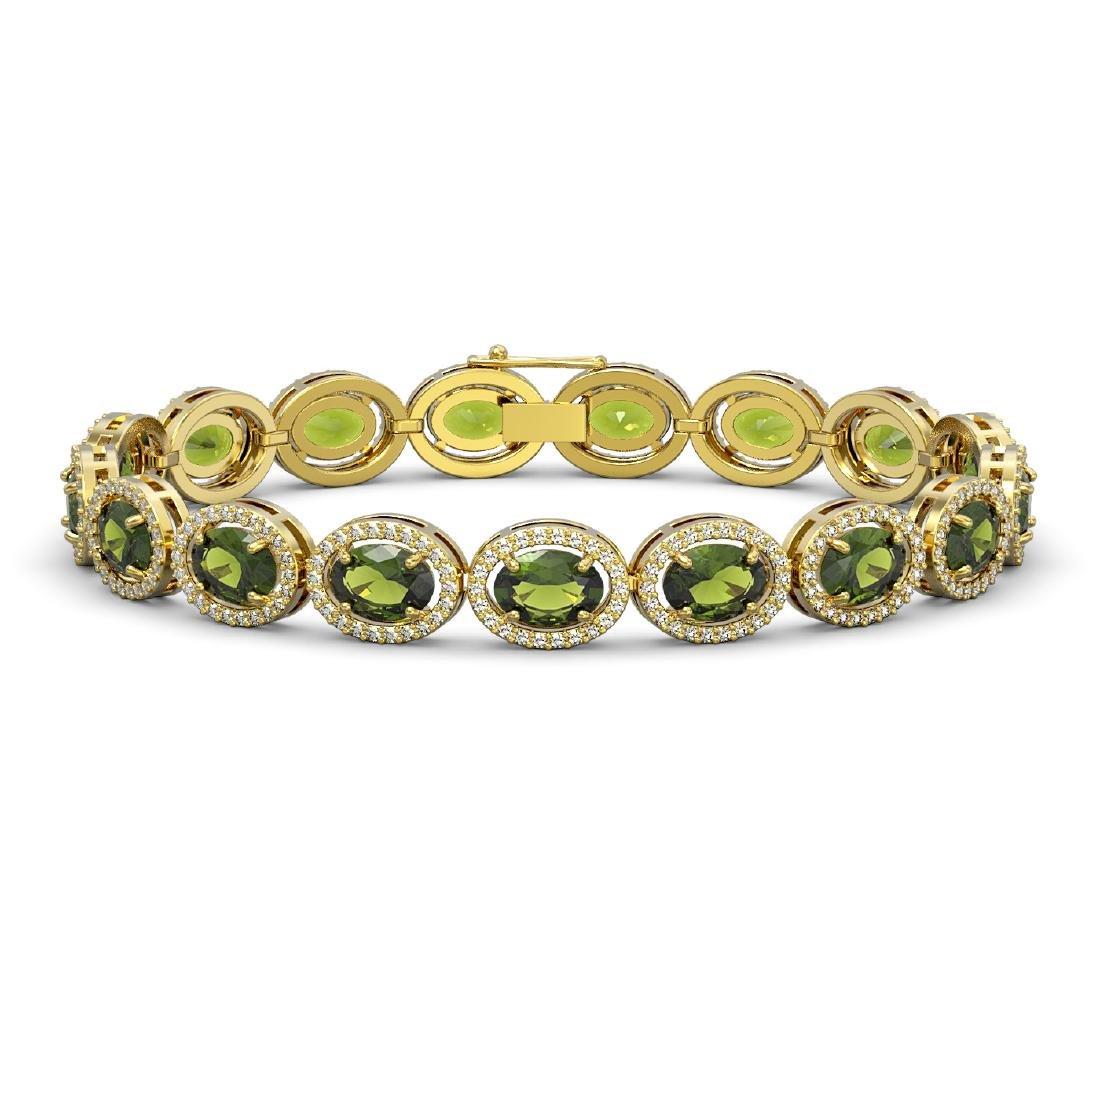 21.71 CTW Tourmaline & Diamond Halo Bracelet 10K Yellow